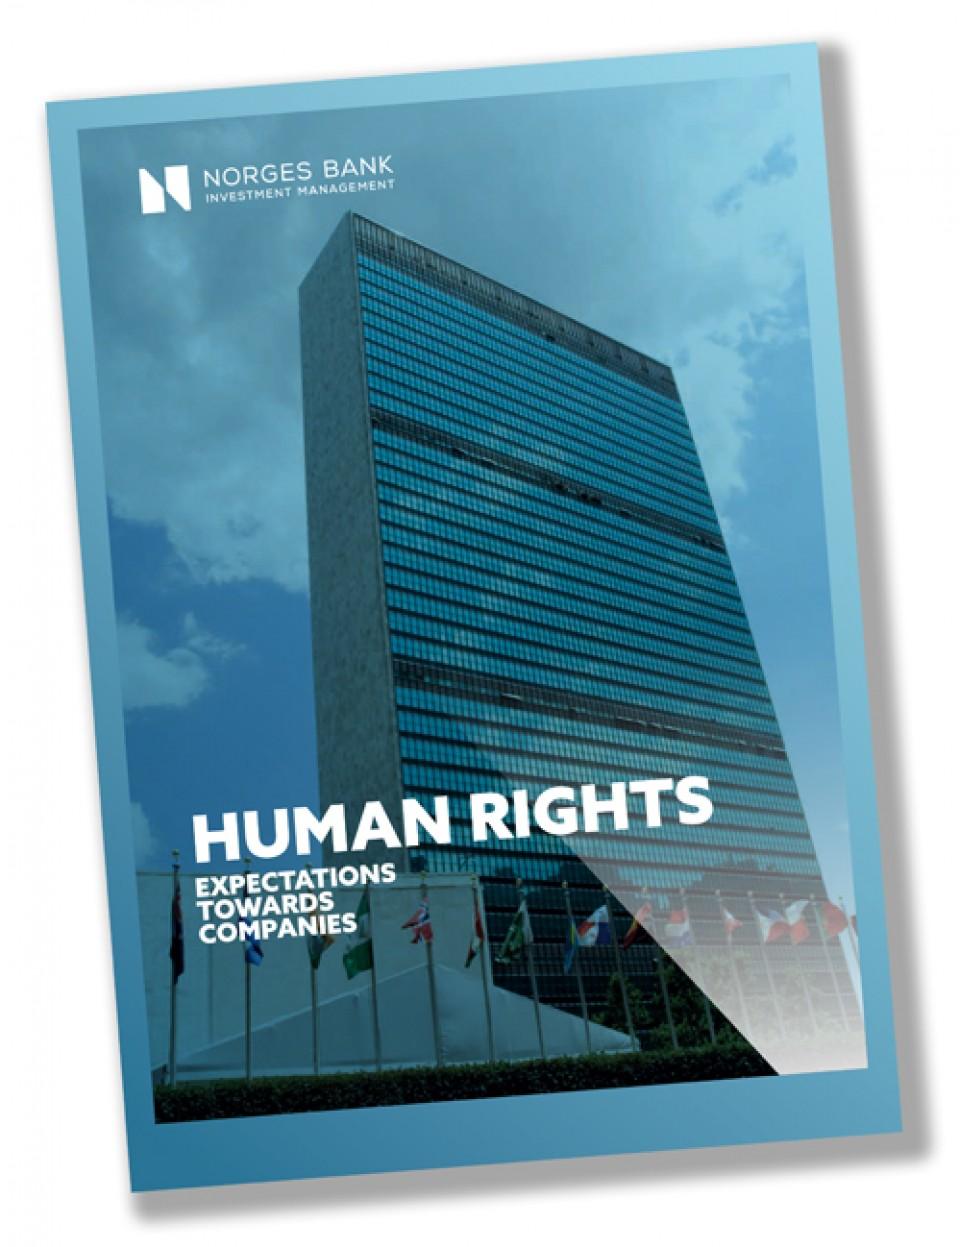 Norwegian Oil Fund Raises Standards on Human Rights